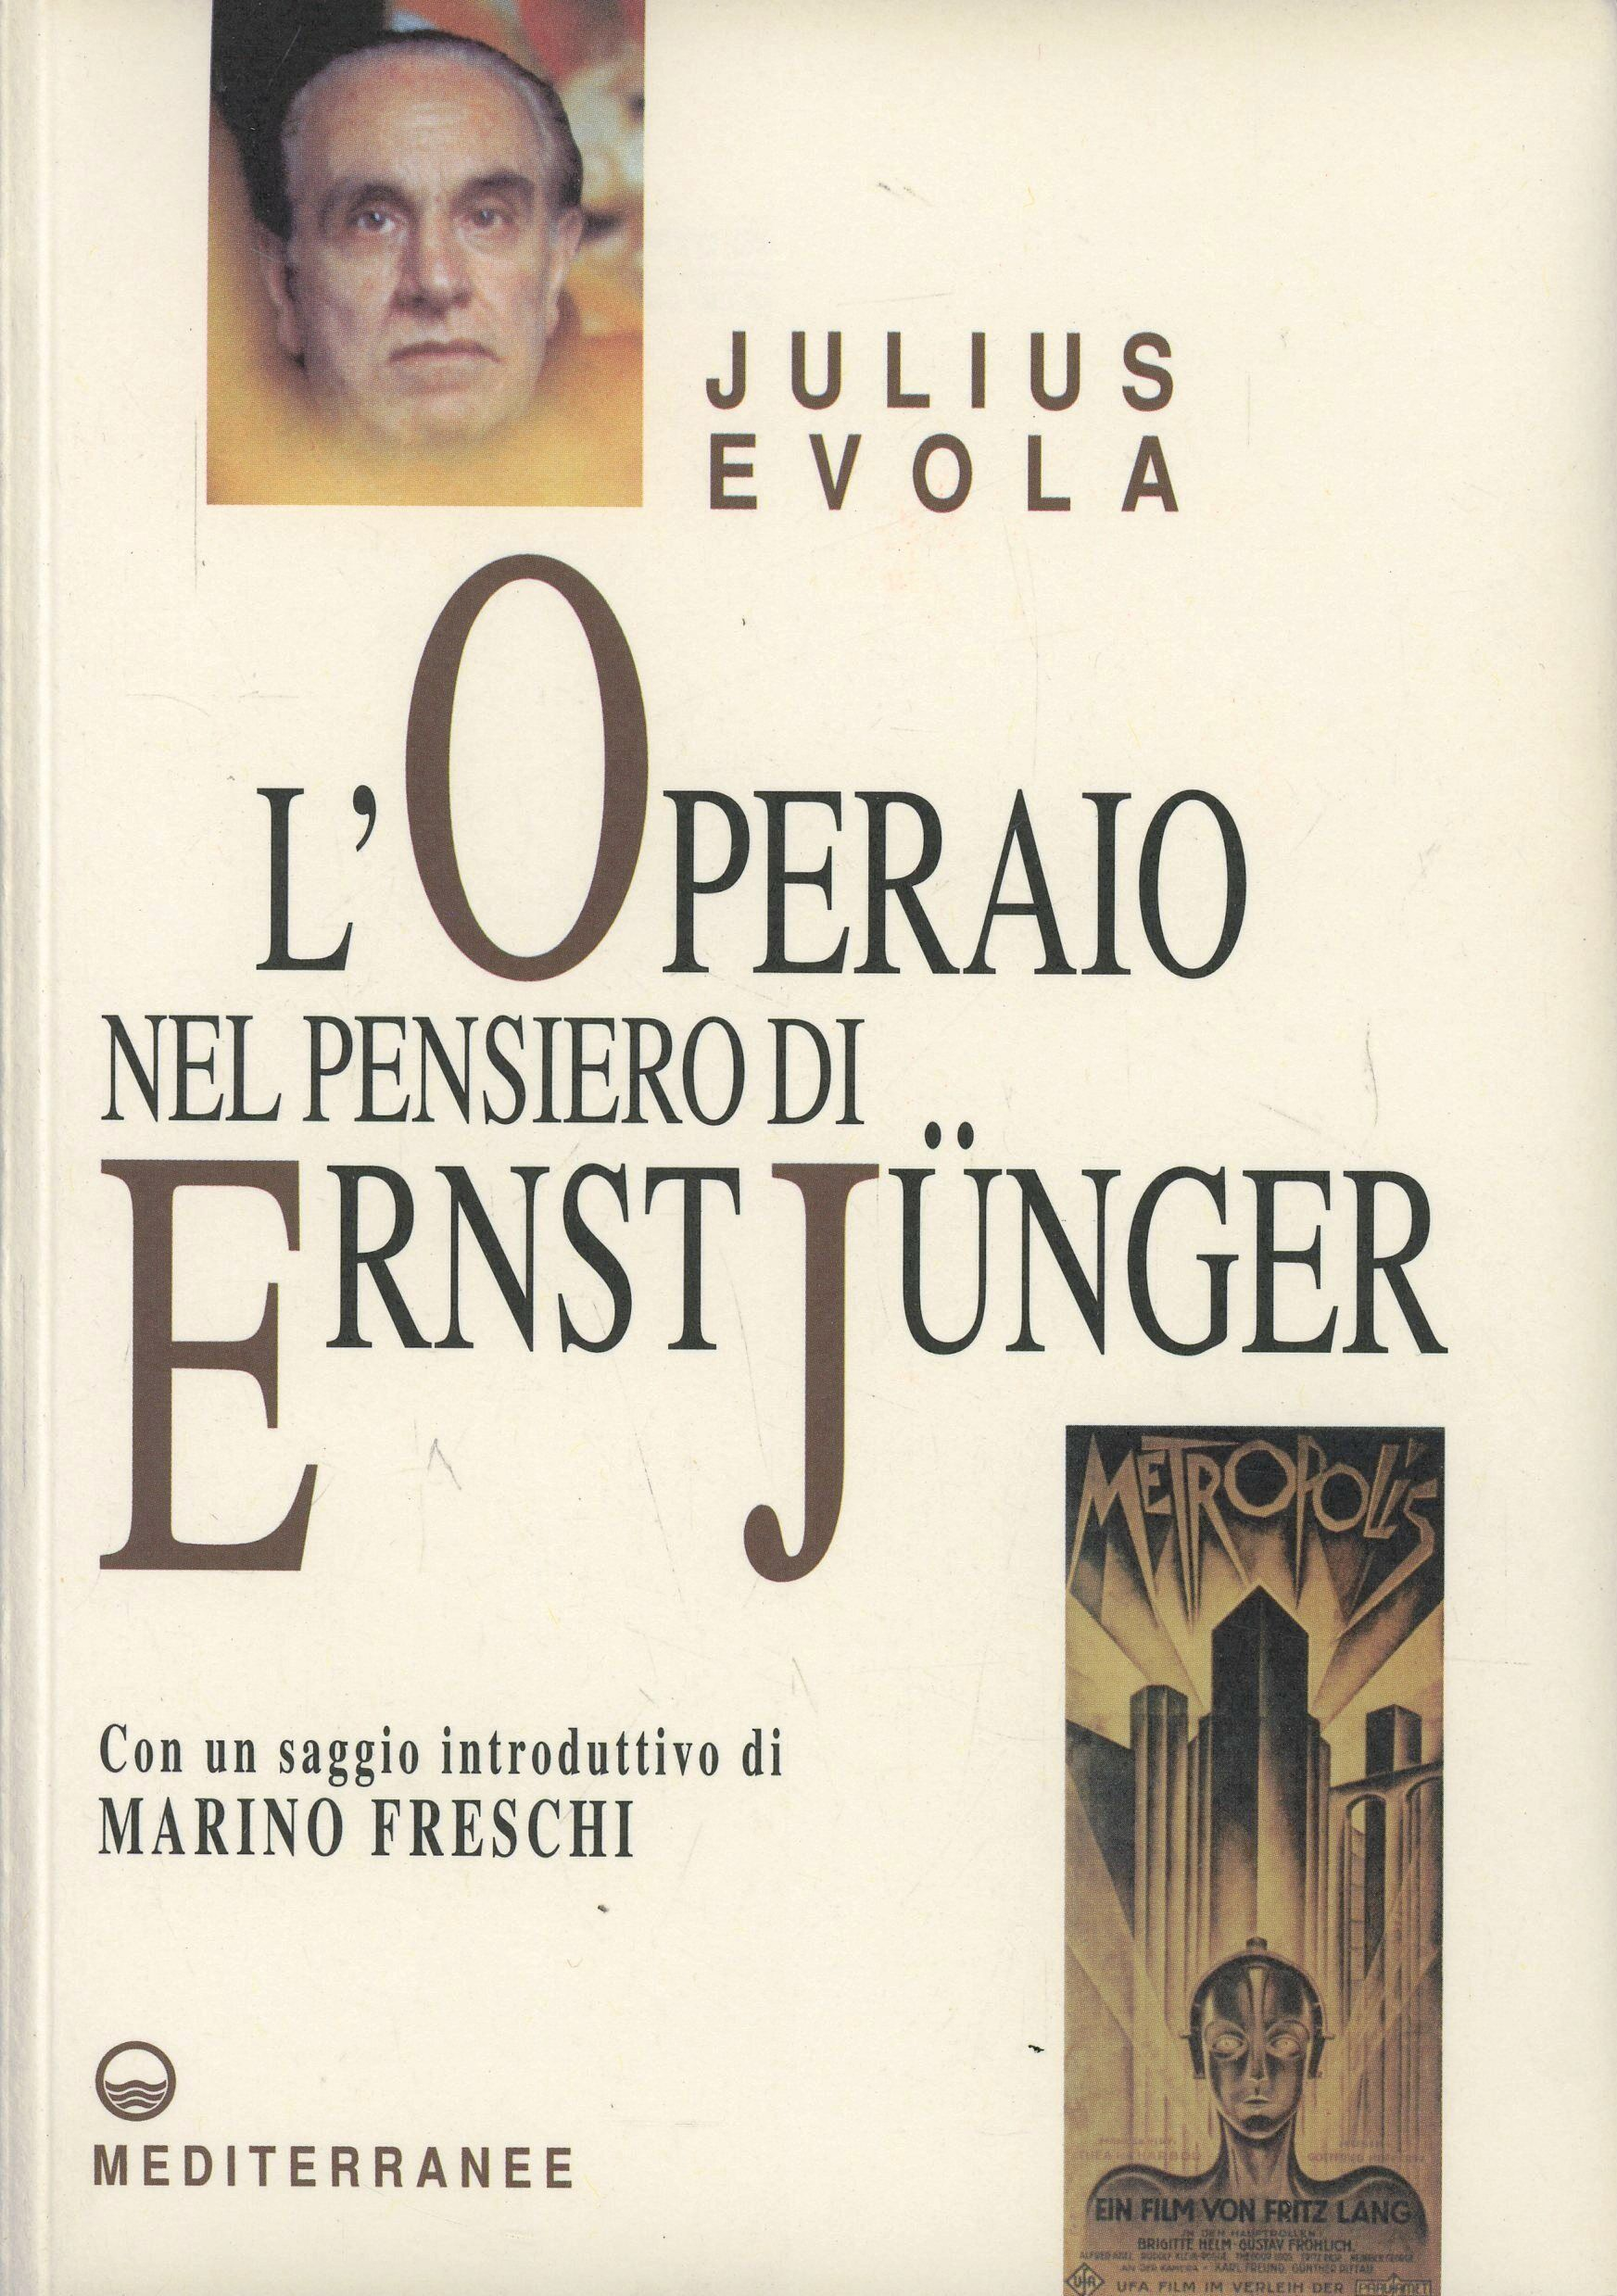 L' operaio nel pensiero di Ernst Jünger